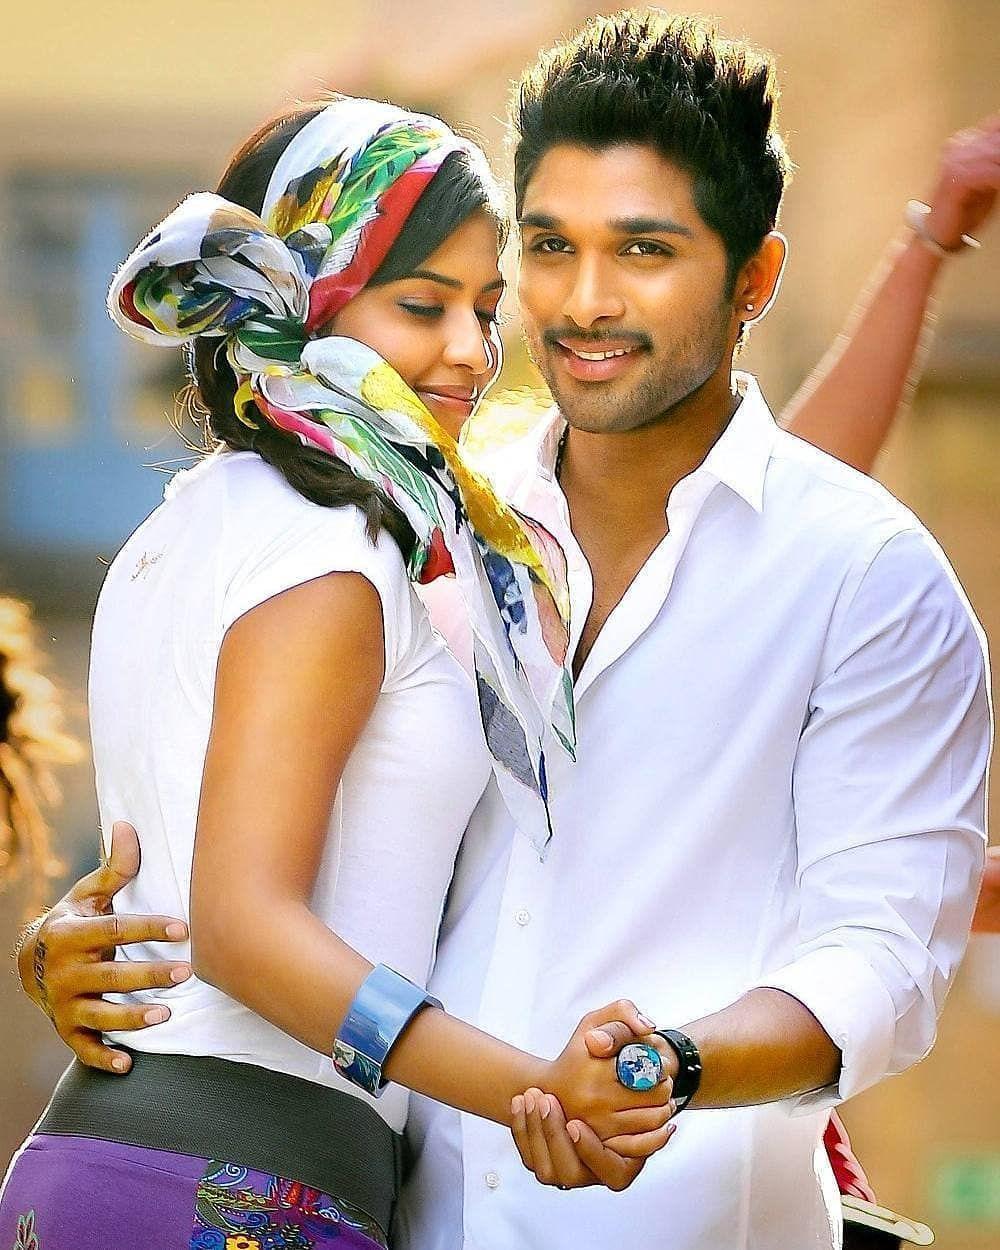 Sanju Komali Allu Arjun Alluarjun Iddarammayilatho Stylishstar Indiancinema Tollywood Tollywoodactor Kollyw Dj Movie Movie Couples Cute Actors